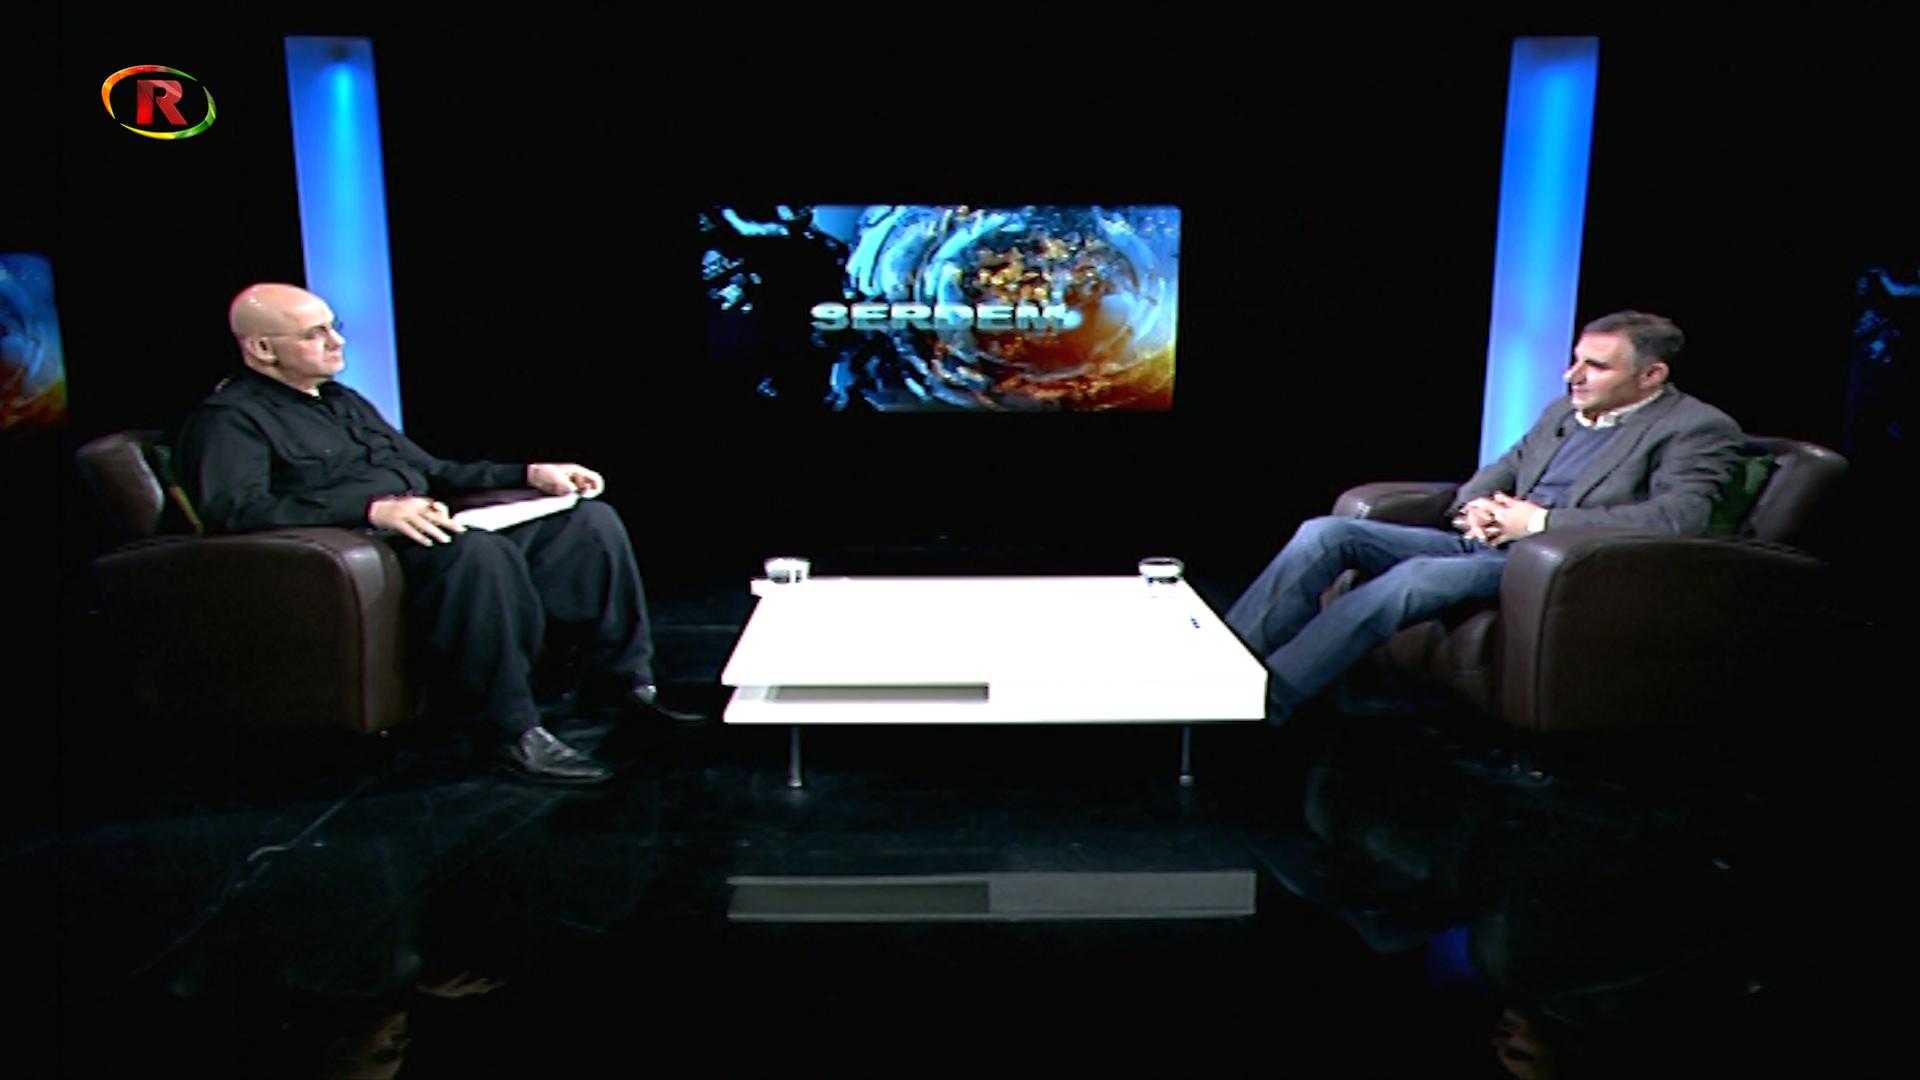 Photo of Ronahi TV – SERDEM